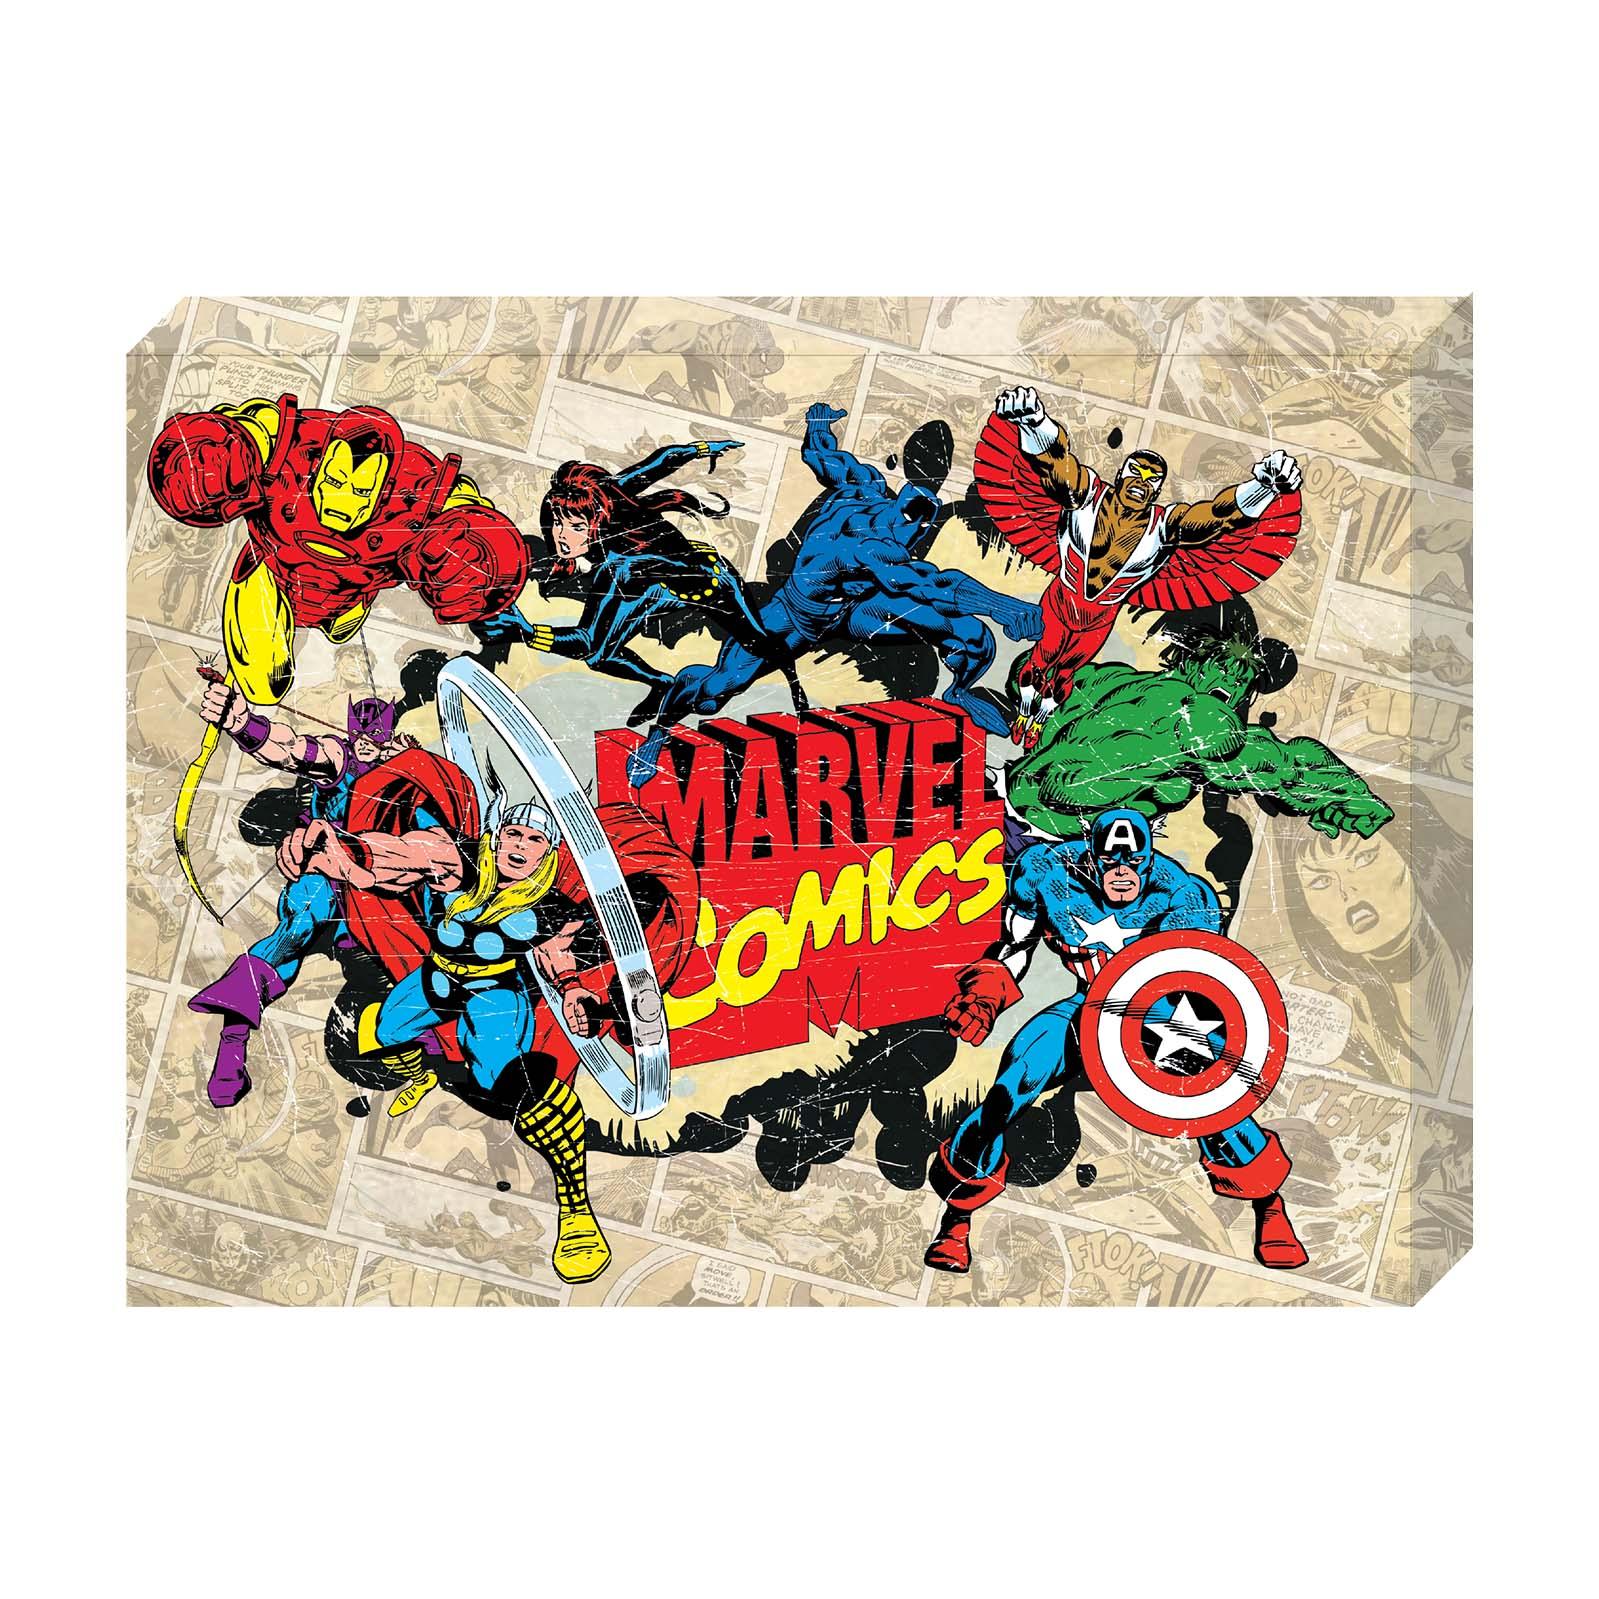 Marvel, Avengers, Spider-Man Canvas $3.00 & MORE - Walmart.com (Online)